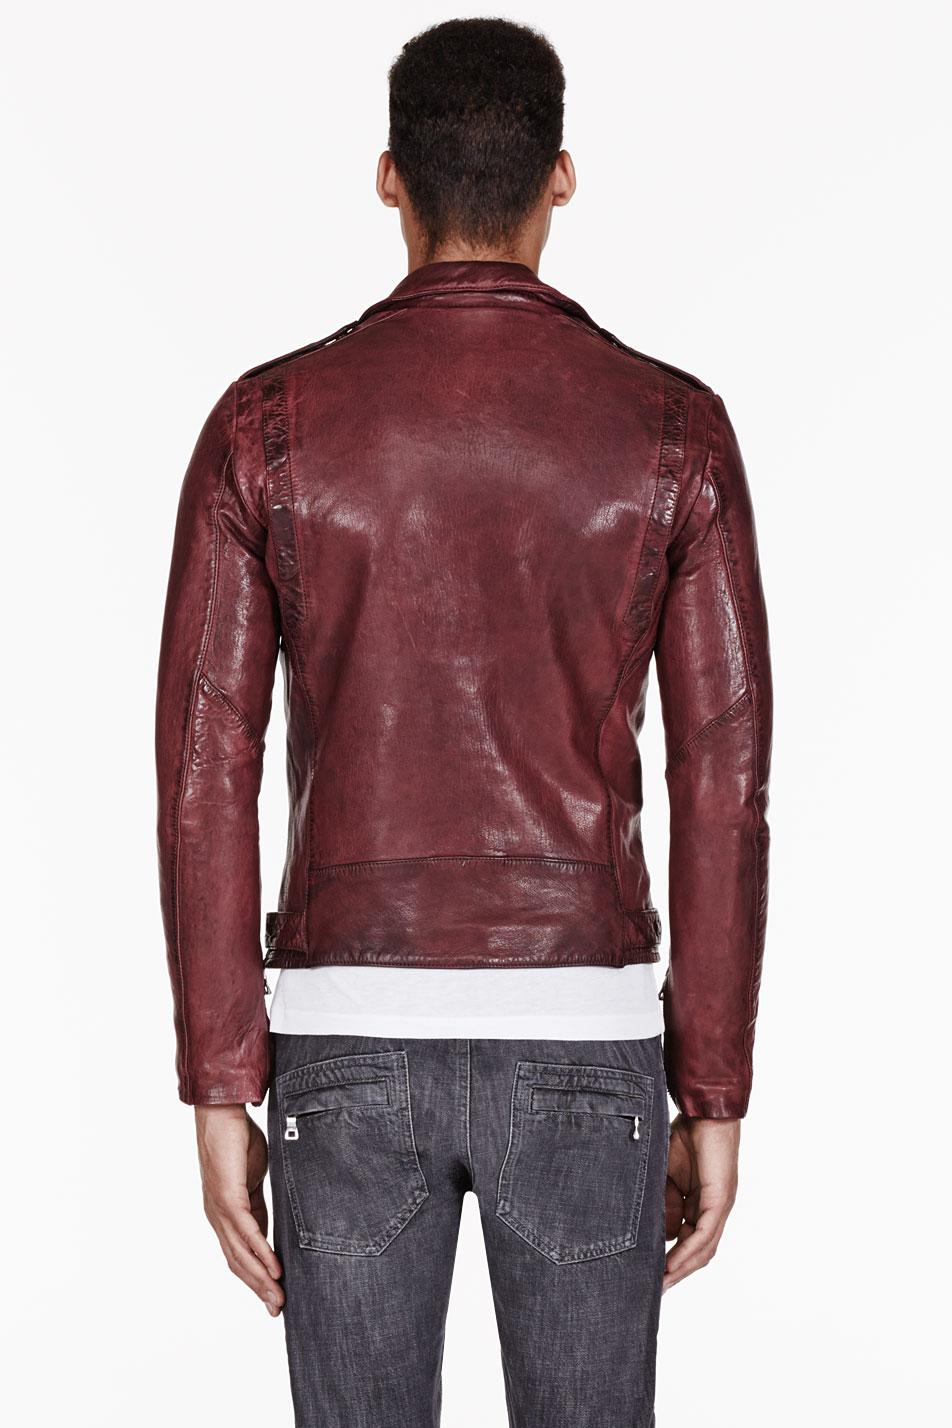 Balmain Burgundy Leather Biker Jacket In Red For Men Lyst